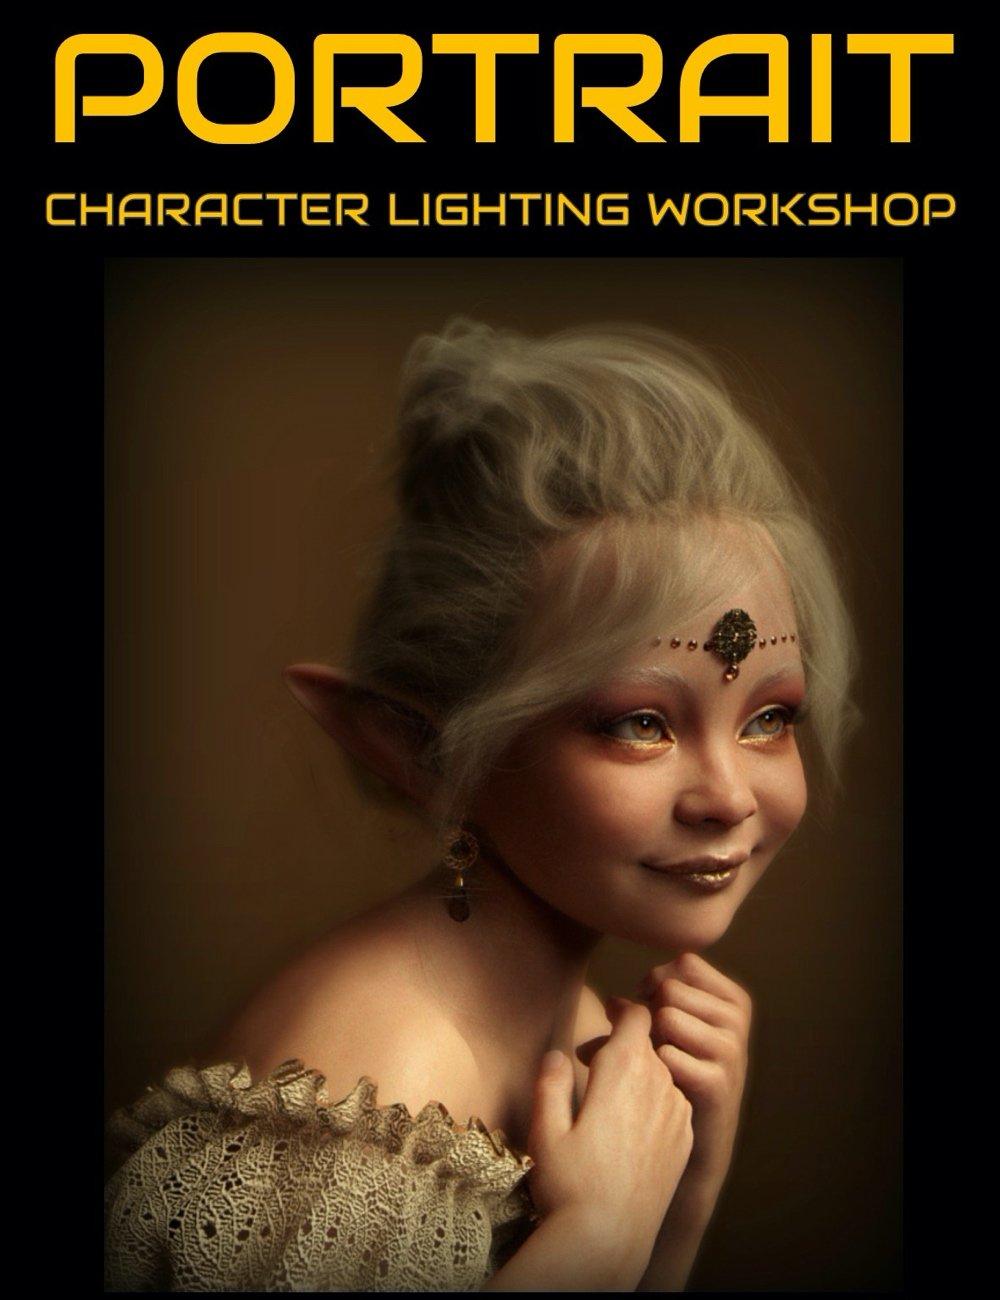 Portrait - Character Lighting Tutorial by: Digital Art Live, 3D Models by Daz 3D